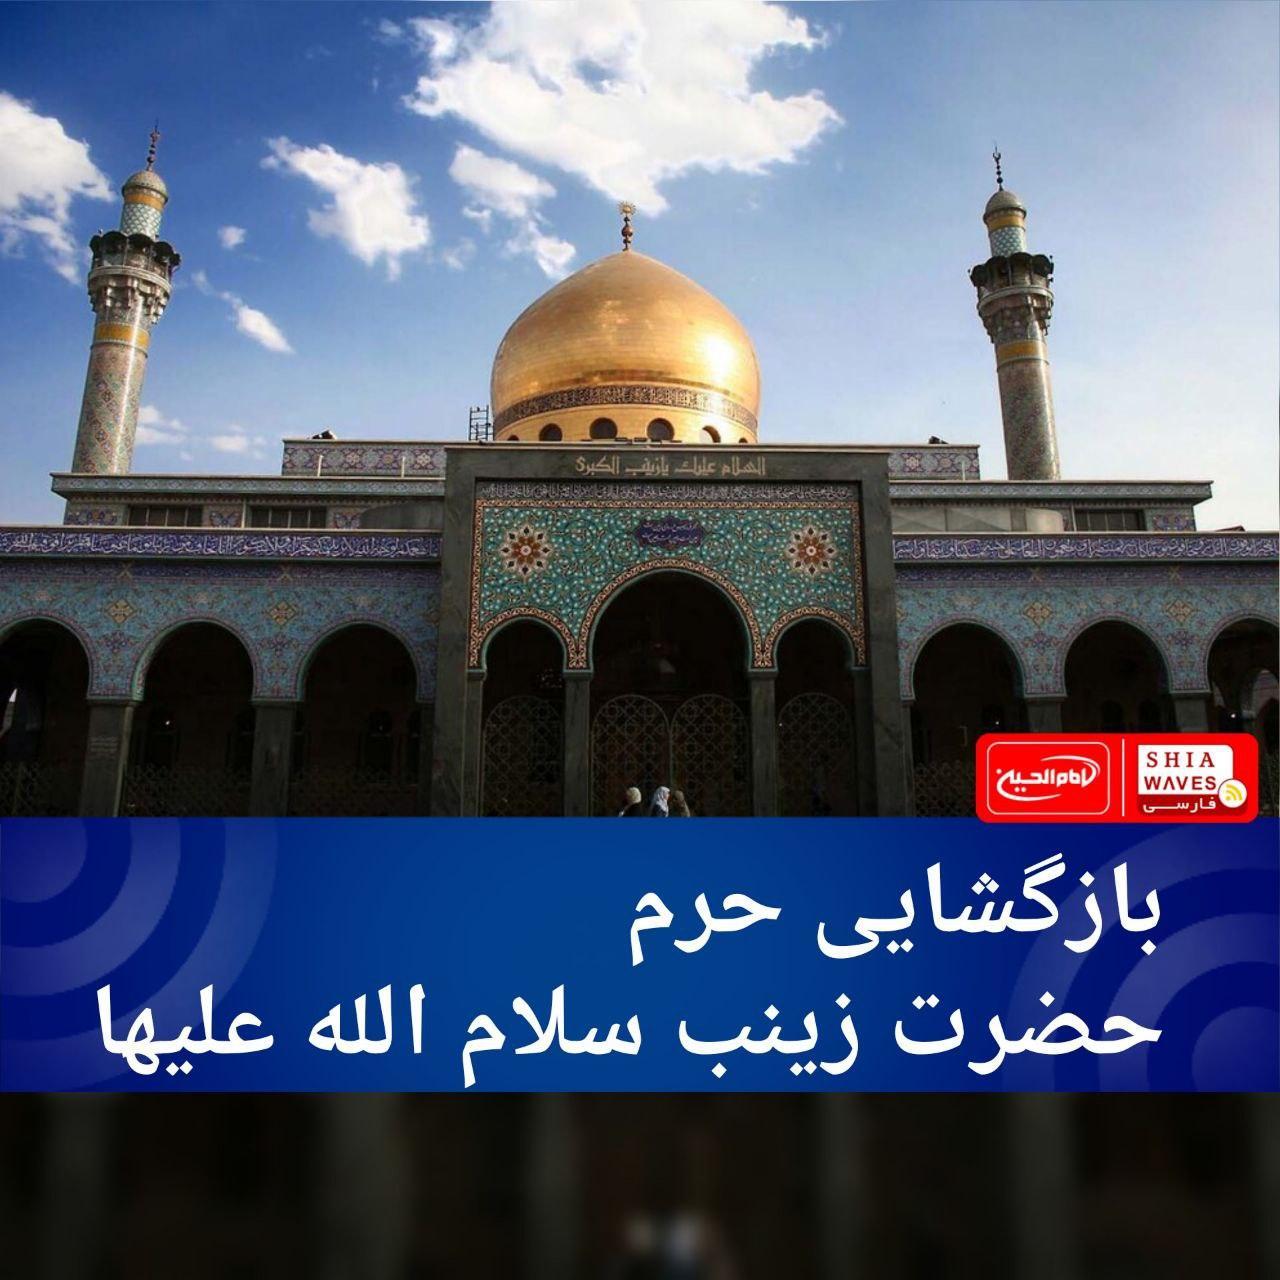 Photo of بازگشایی حرم حضرت زینب سلام الله علیها